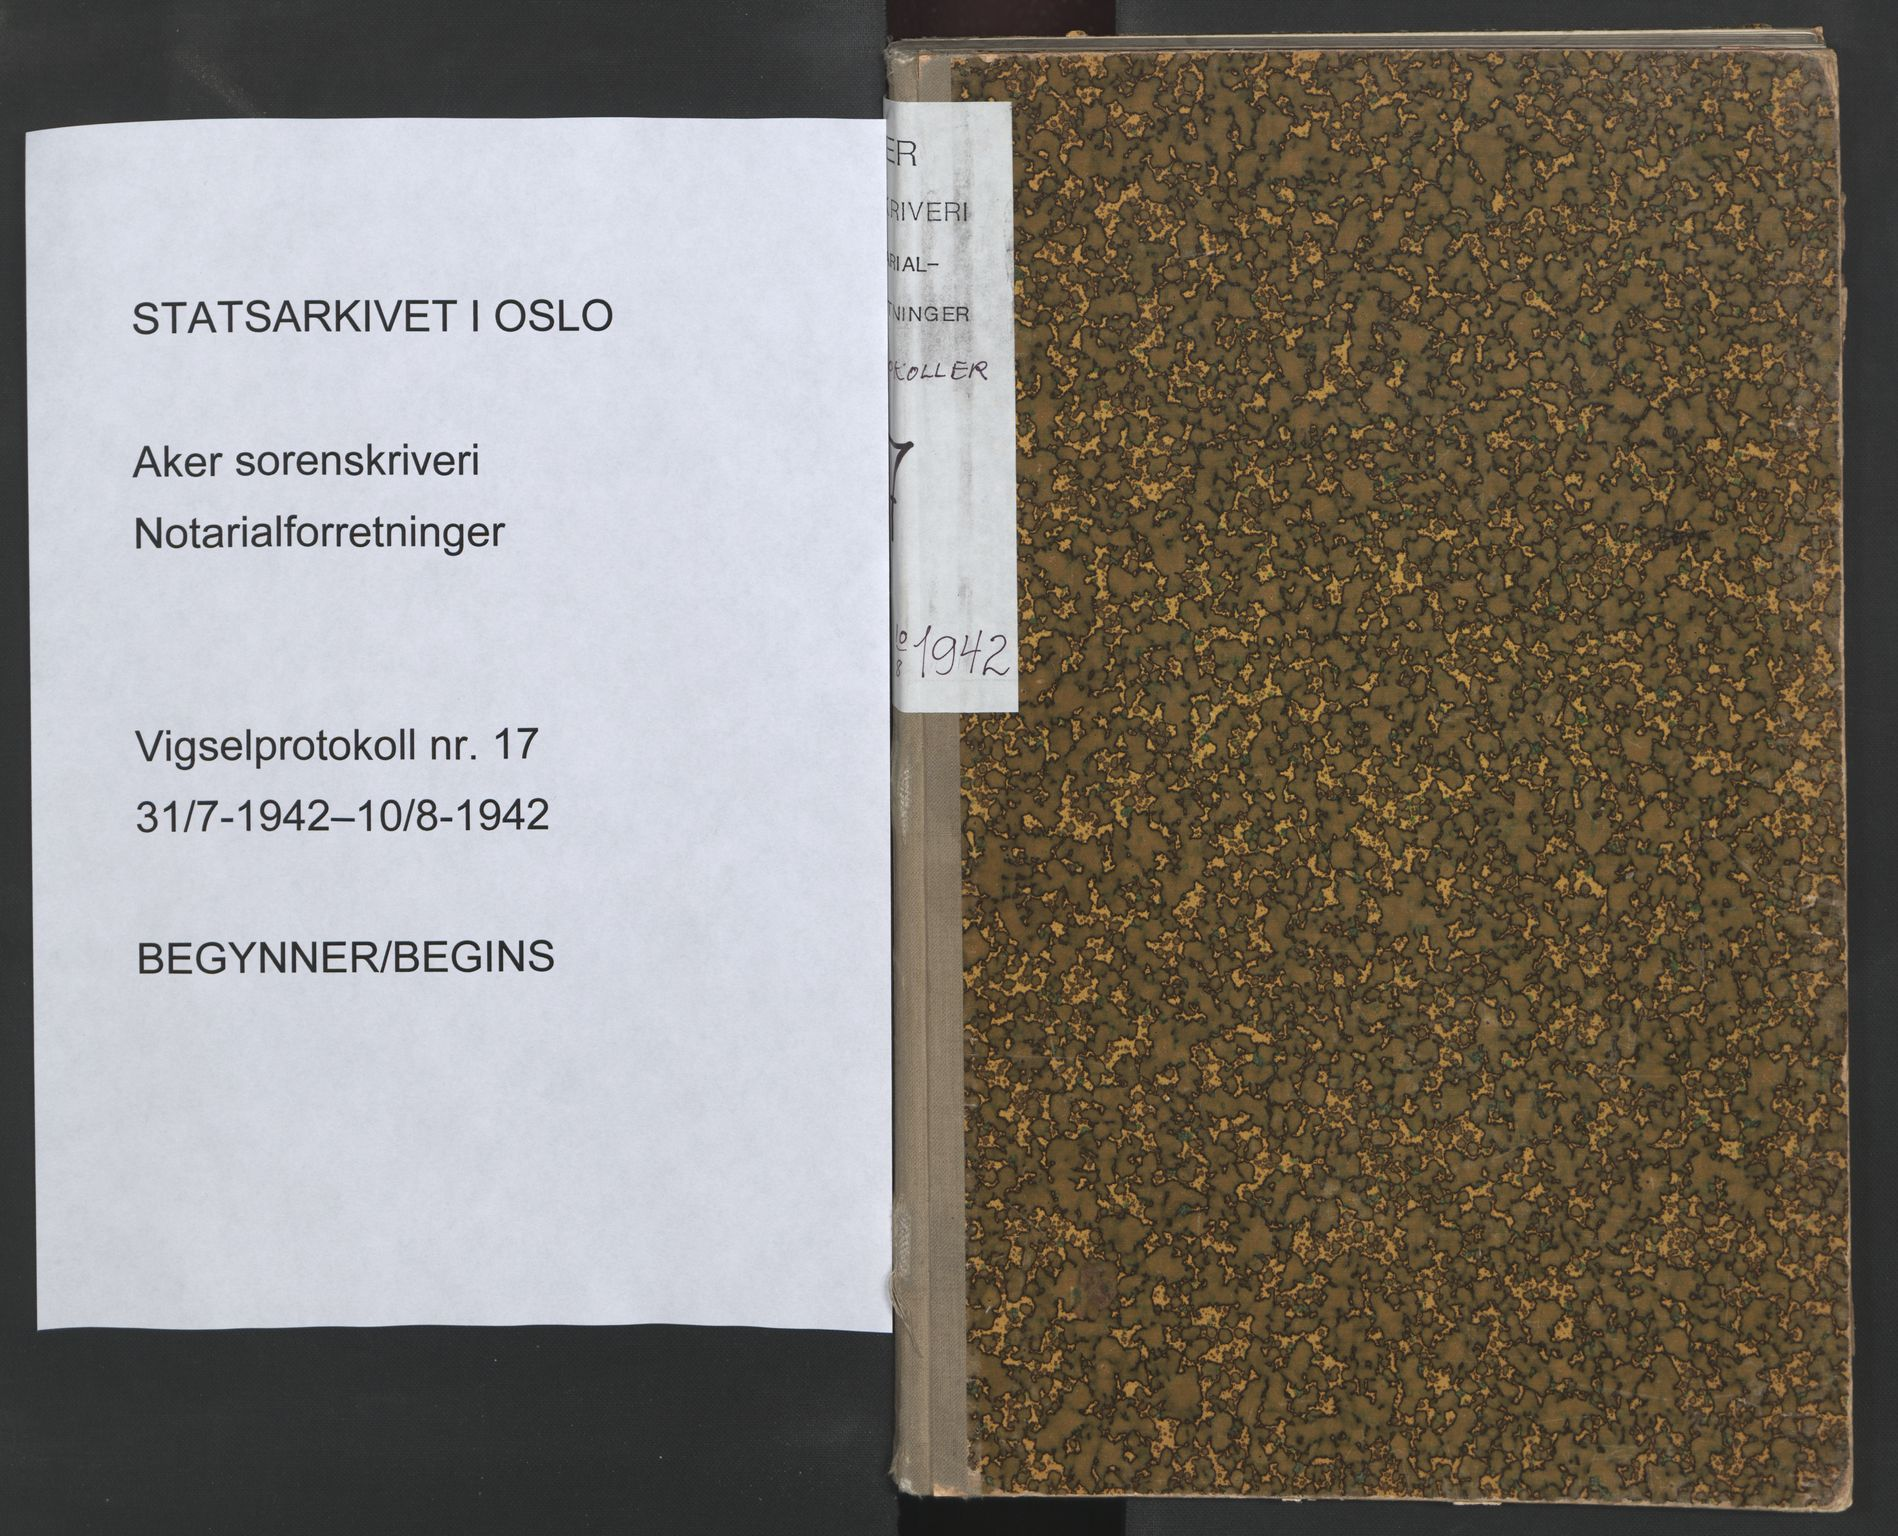 SAO, Aker sorenskriveri, L/Lc/Lcb/L0017: Vigselprotokoll, 1942, s. upaginert